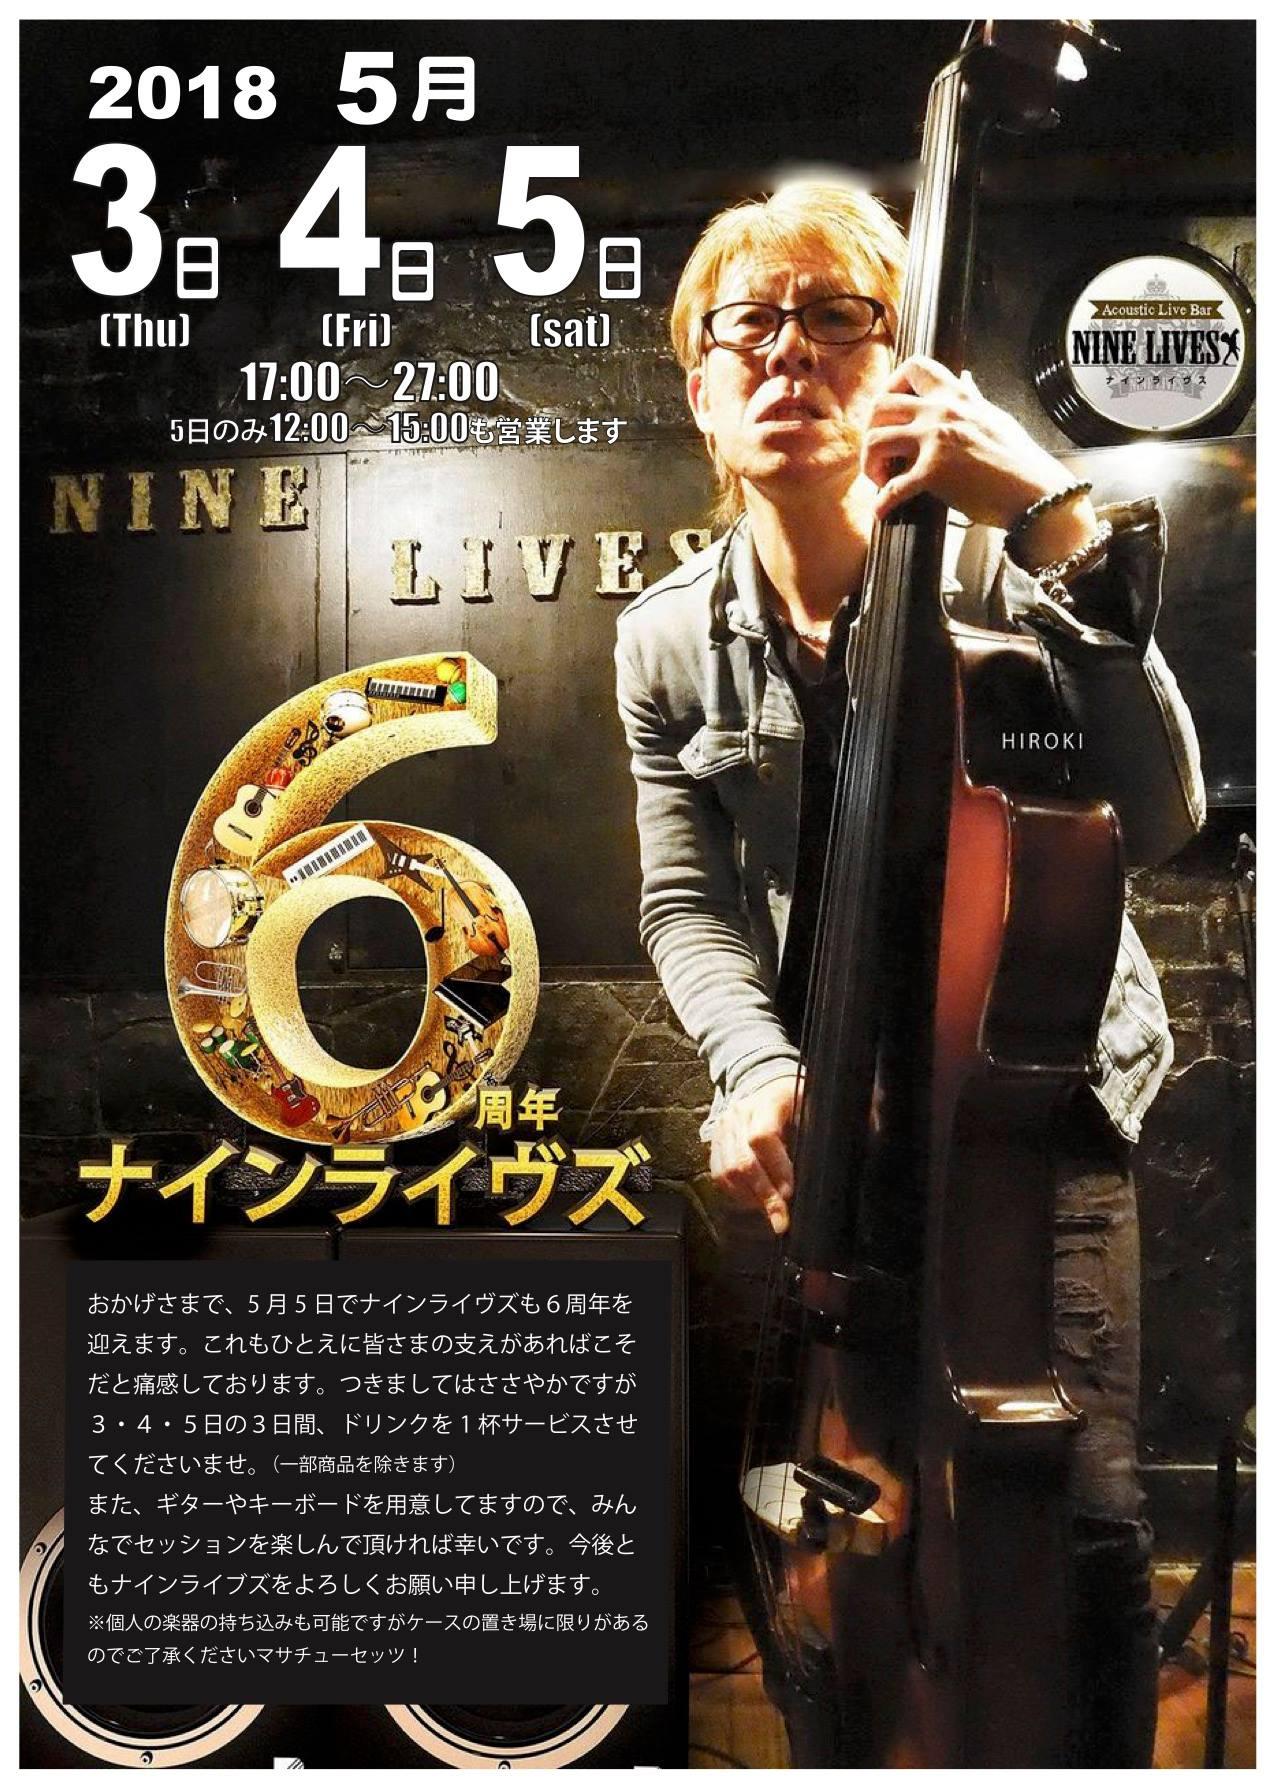 NINE LIVES 6th Anniversary